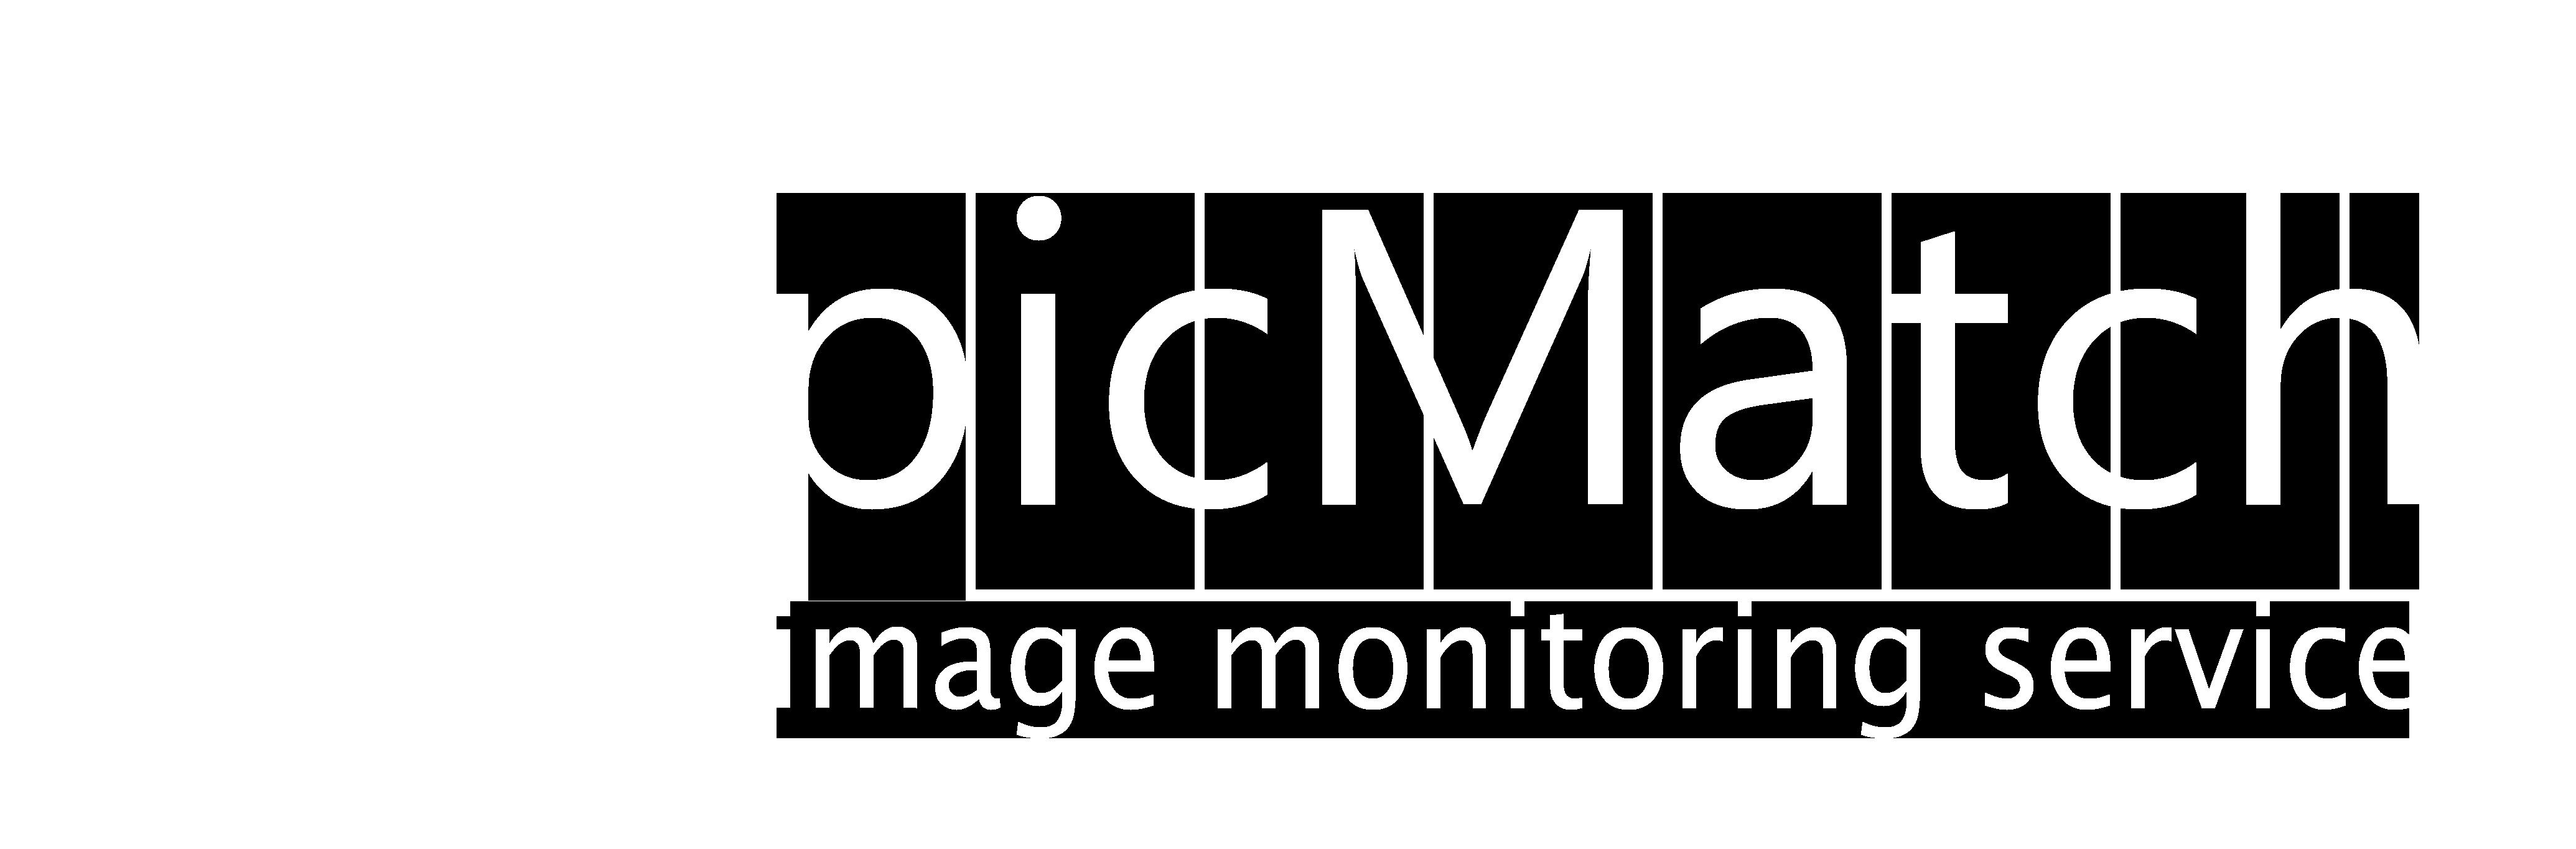 picMatch - Image Monitoring Service - Logo